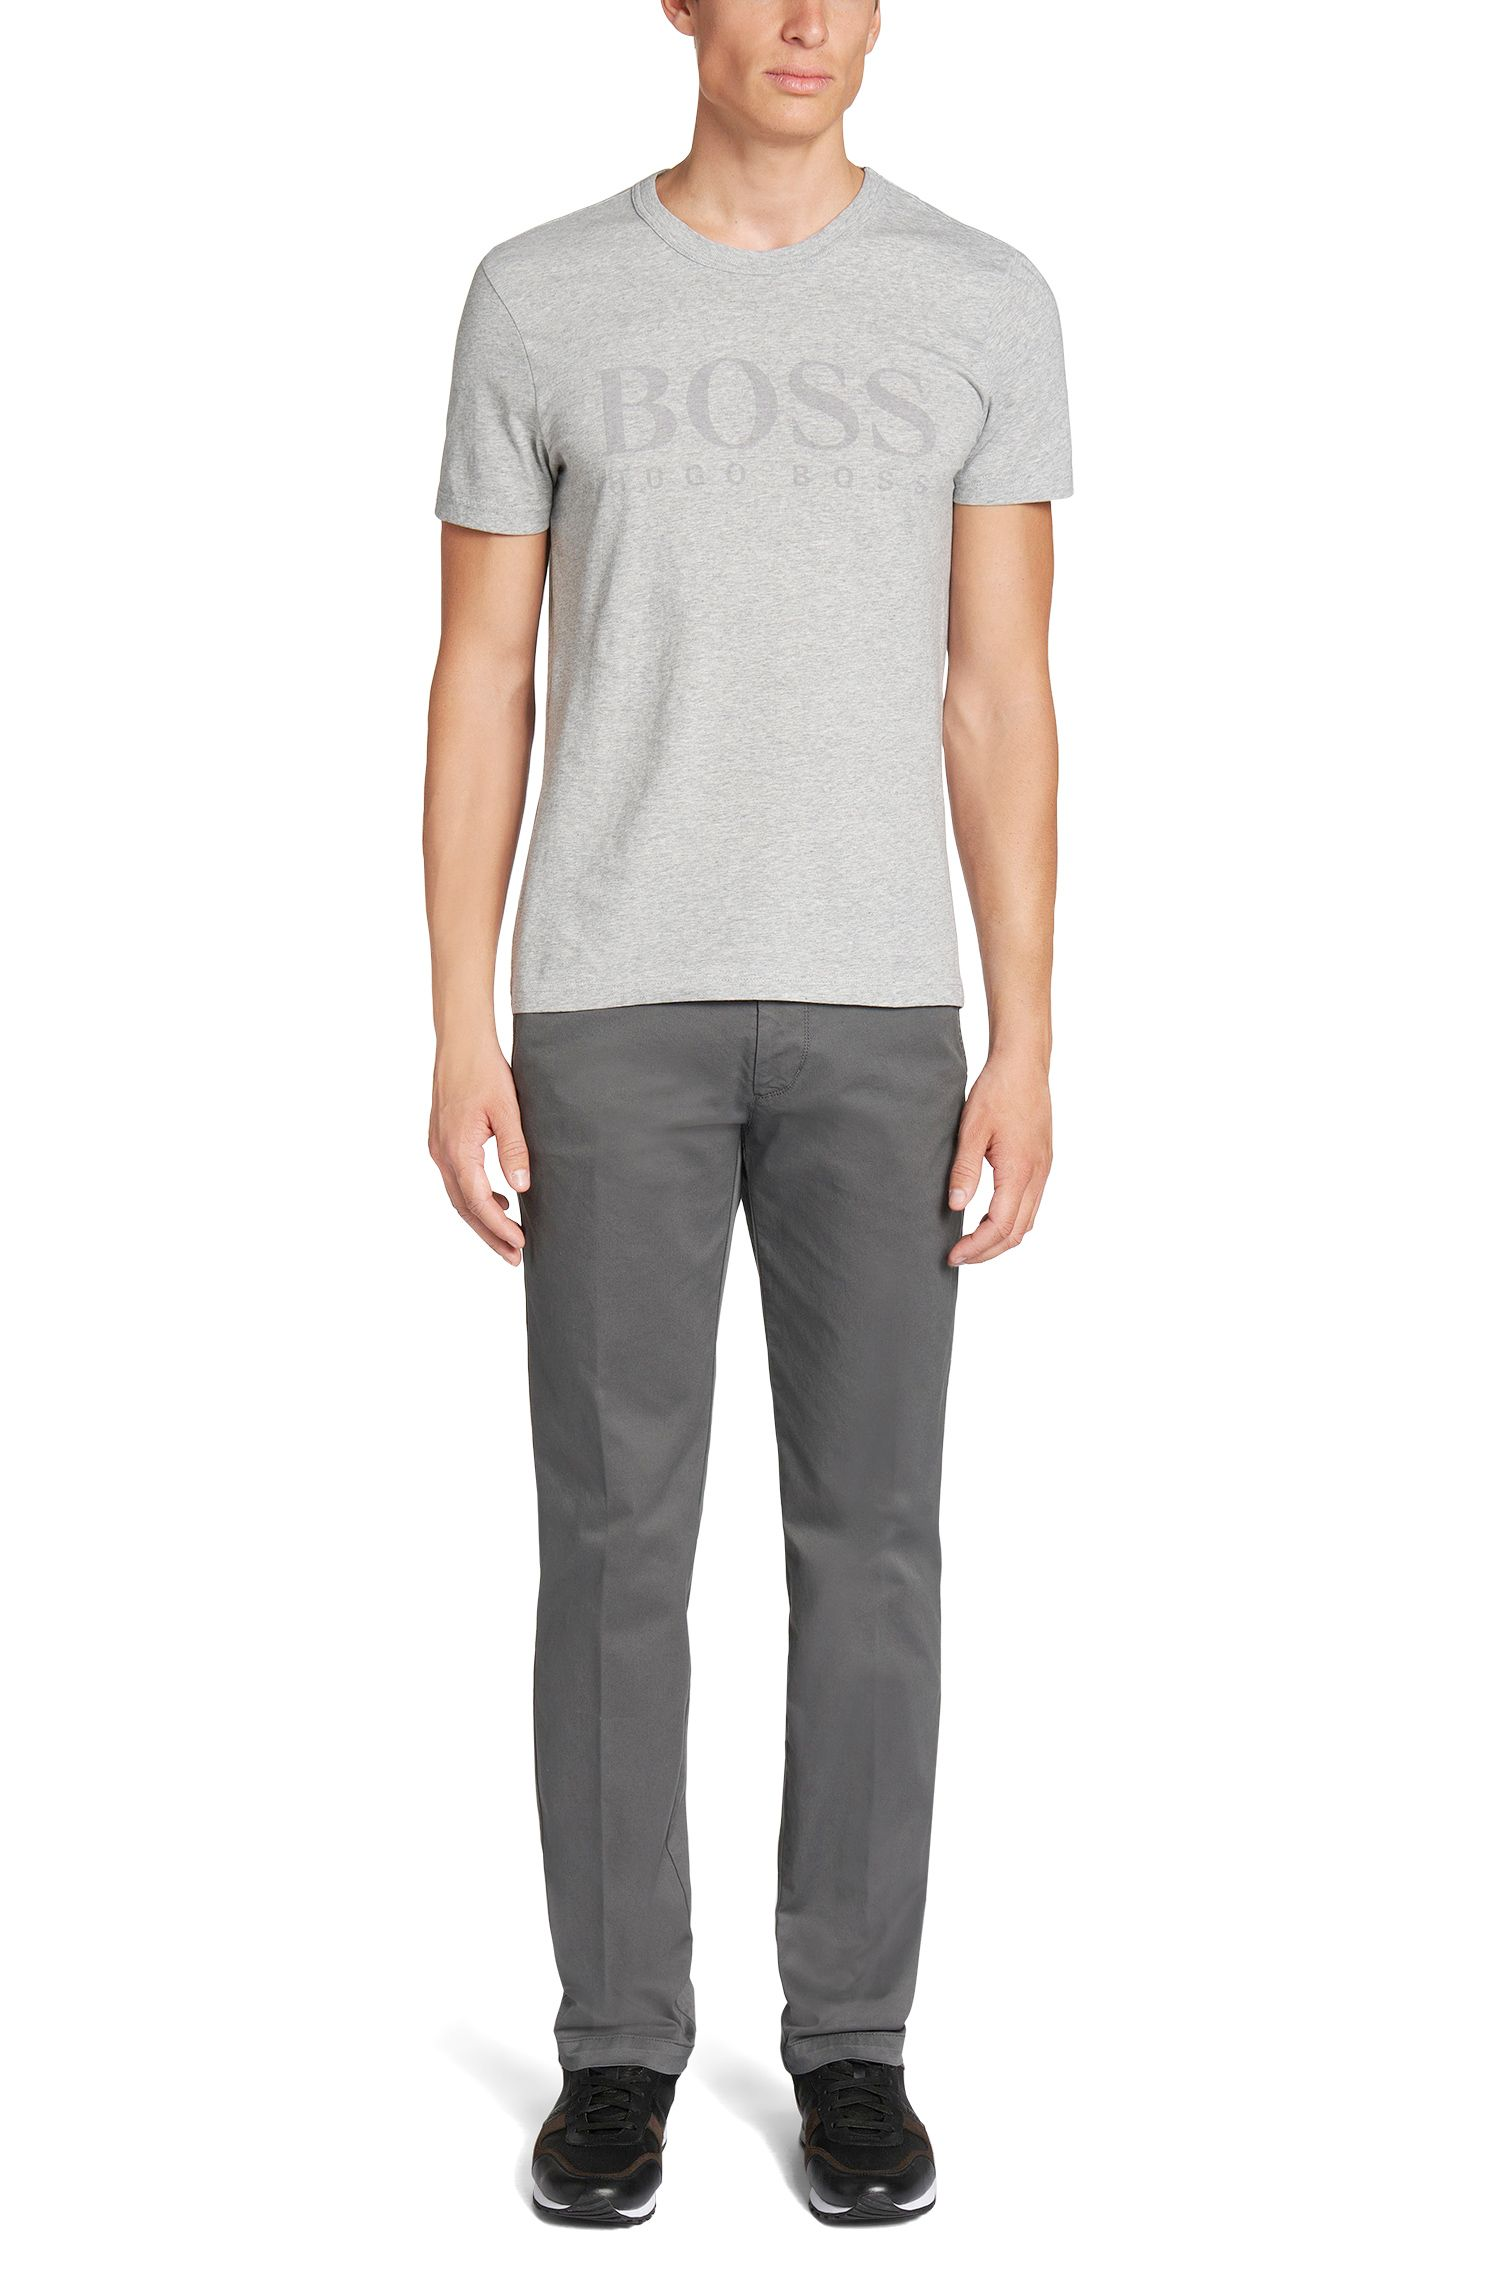 Slim-Fit T-Shirt aus Baumwolle mit Logo-Print: 'Lecco 144'